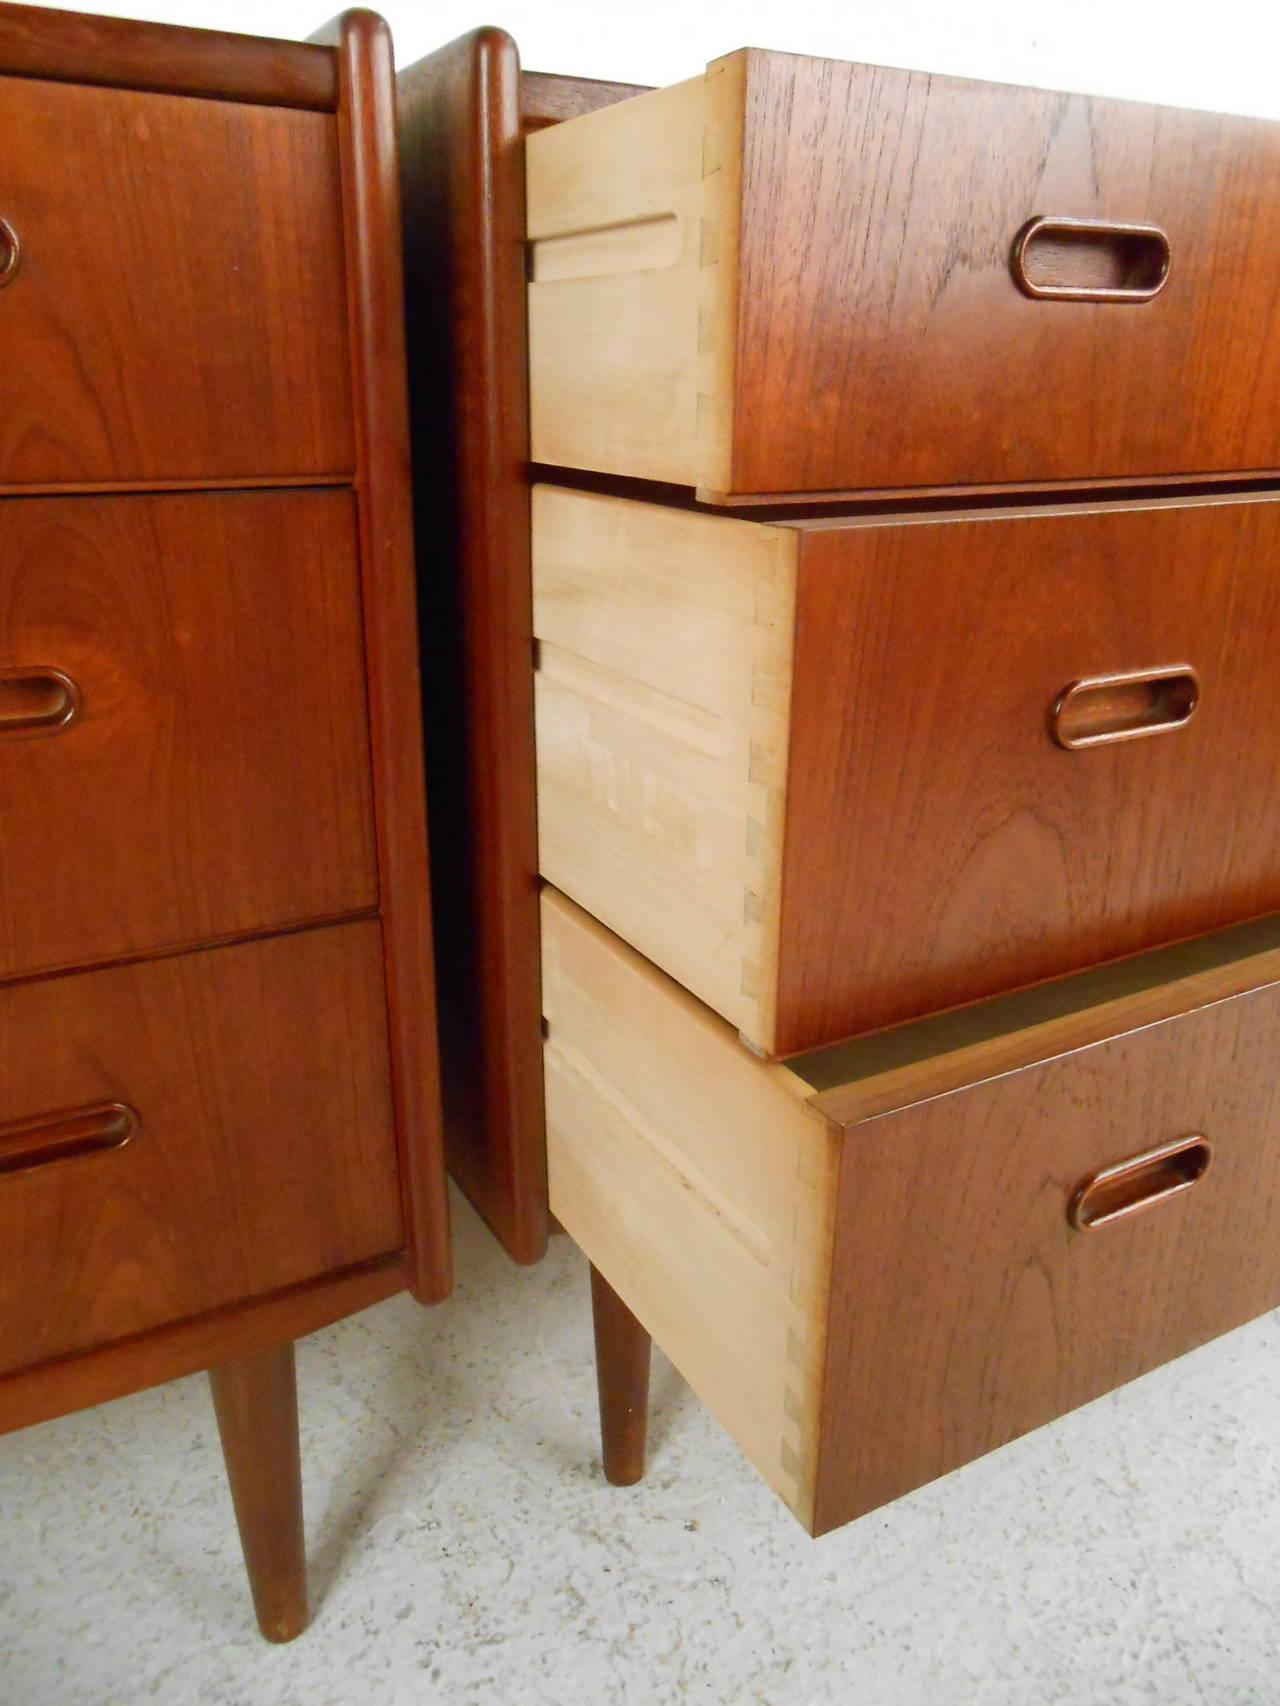 Pair of Mid Century Modern Danish Teak Bedroom Dressers For Sale at 1stdibs